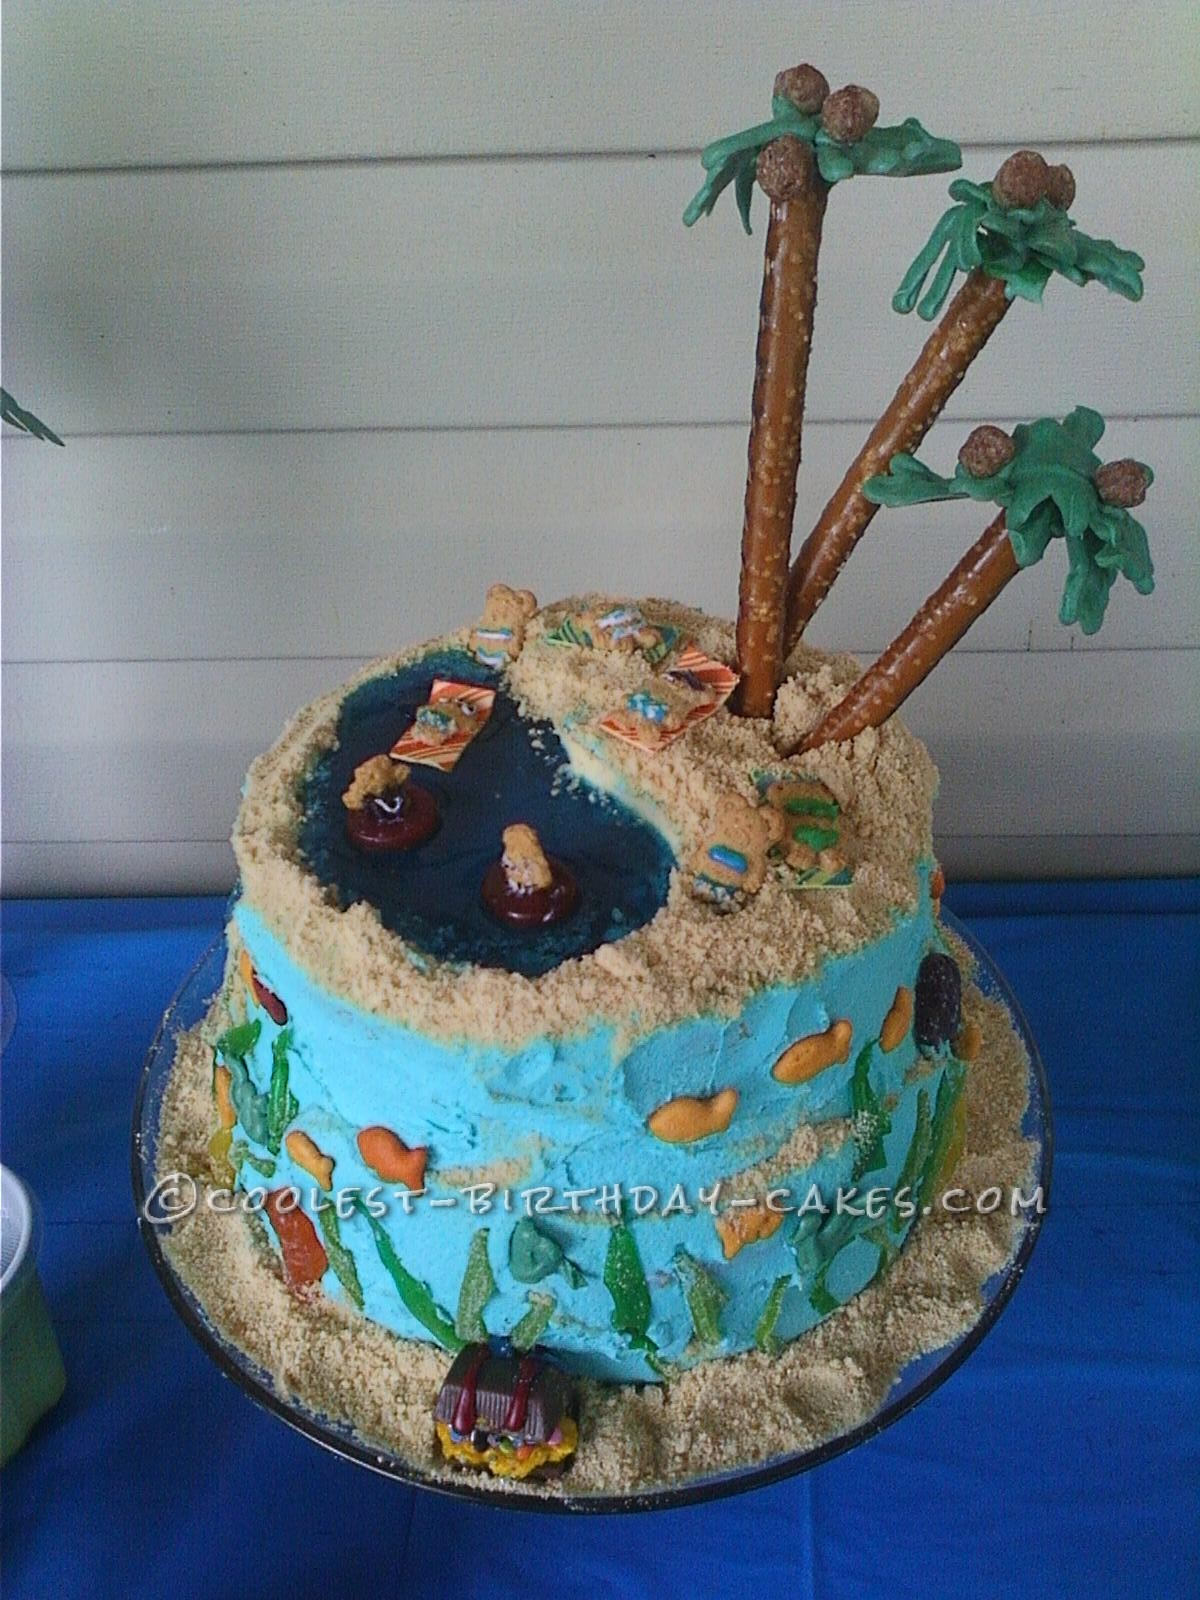 Coolest Homemade All Edible Beach Birthday Cake